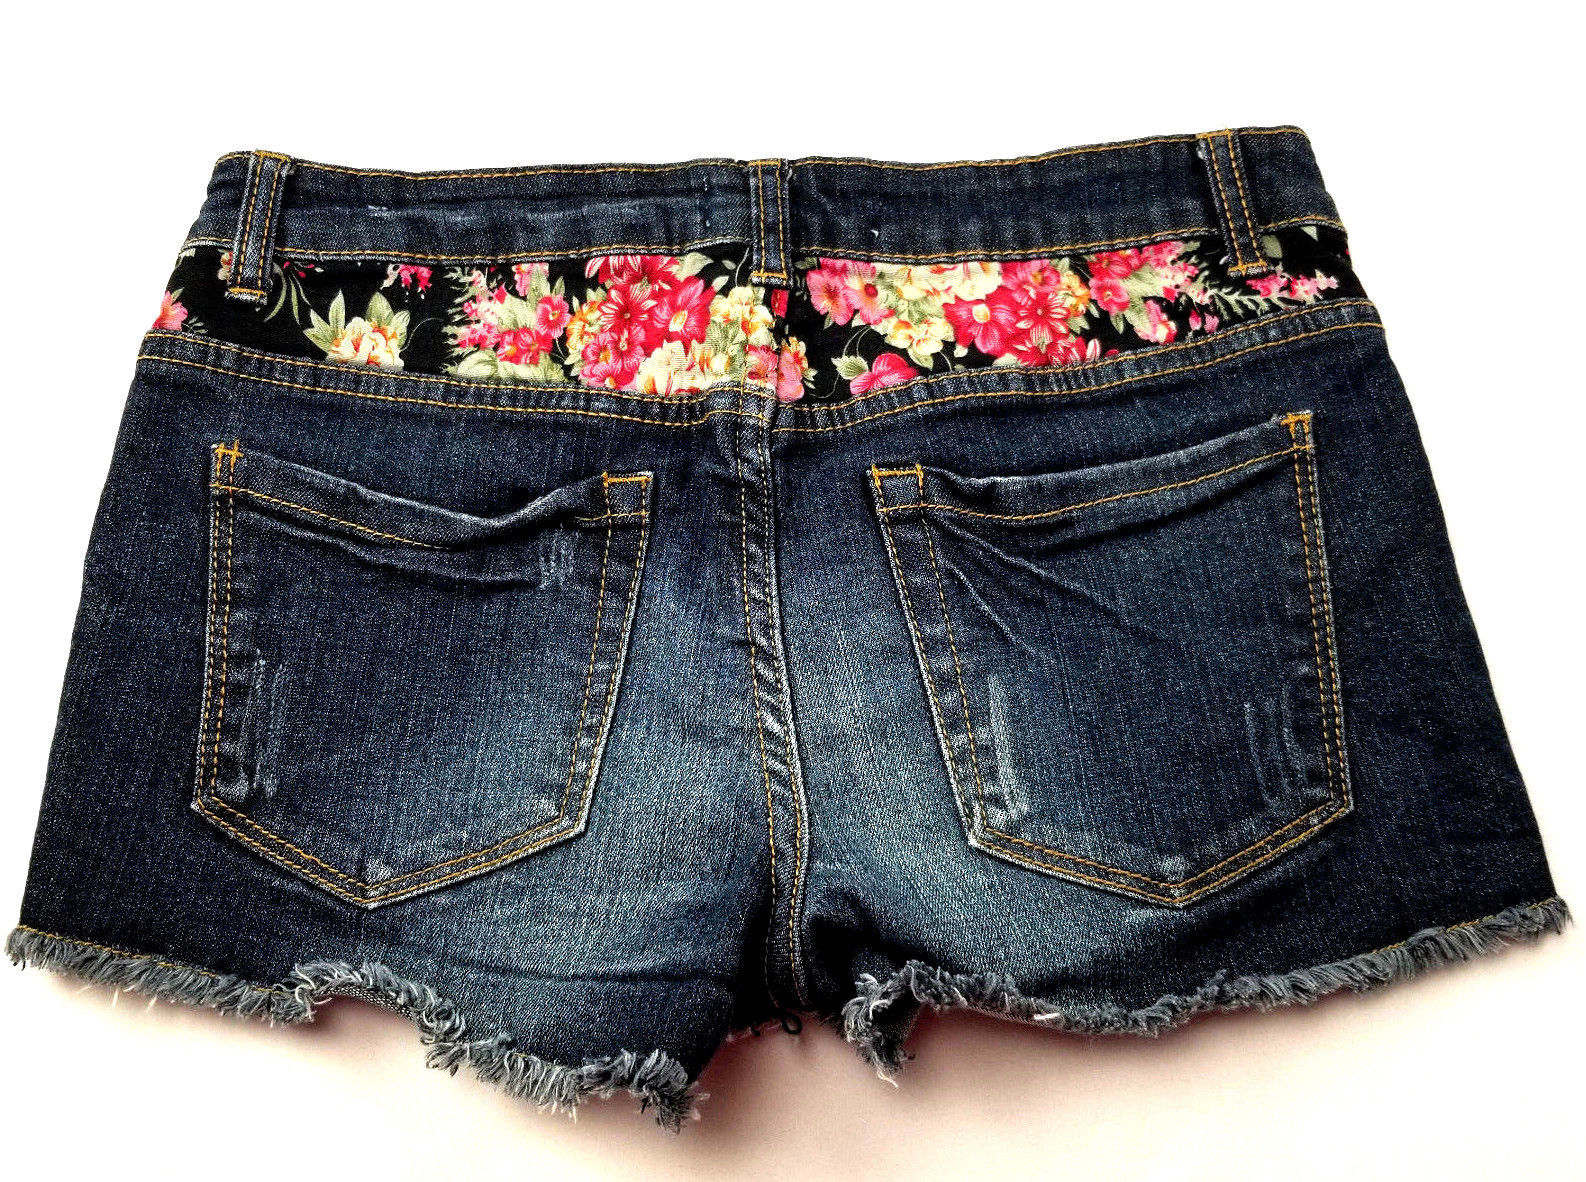 2.1 Denim Womens Jean Short Shorts Size 27 Flower Detail Distressed image 2